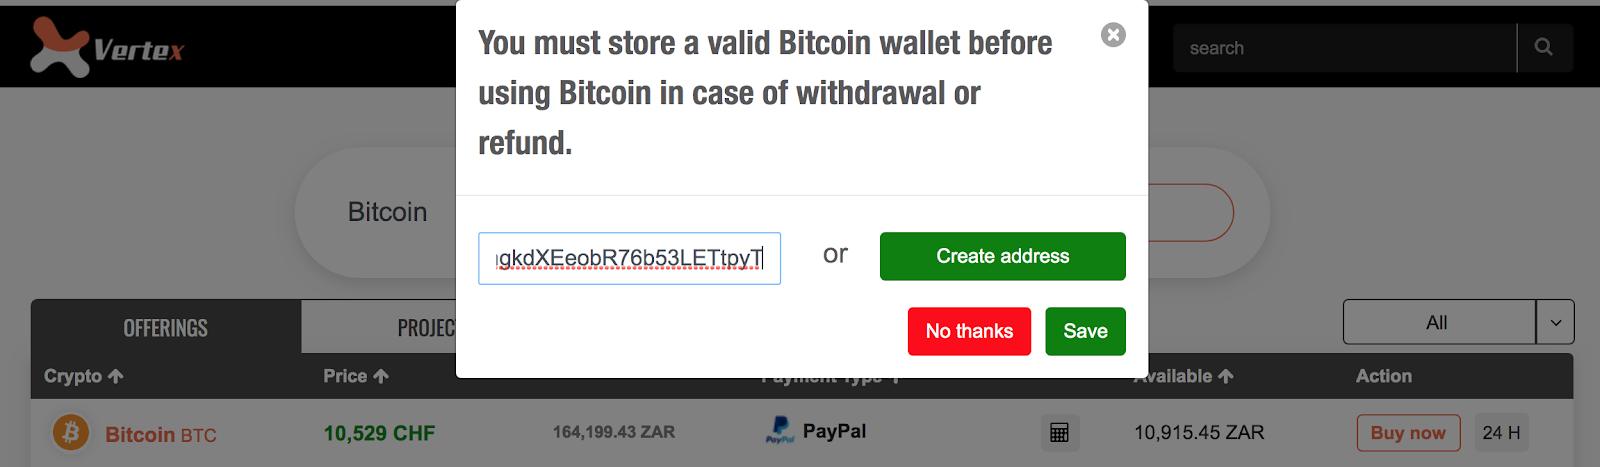 bitcoin mobile app bitcoin mining usb hub